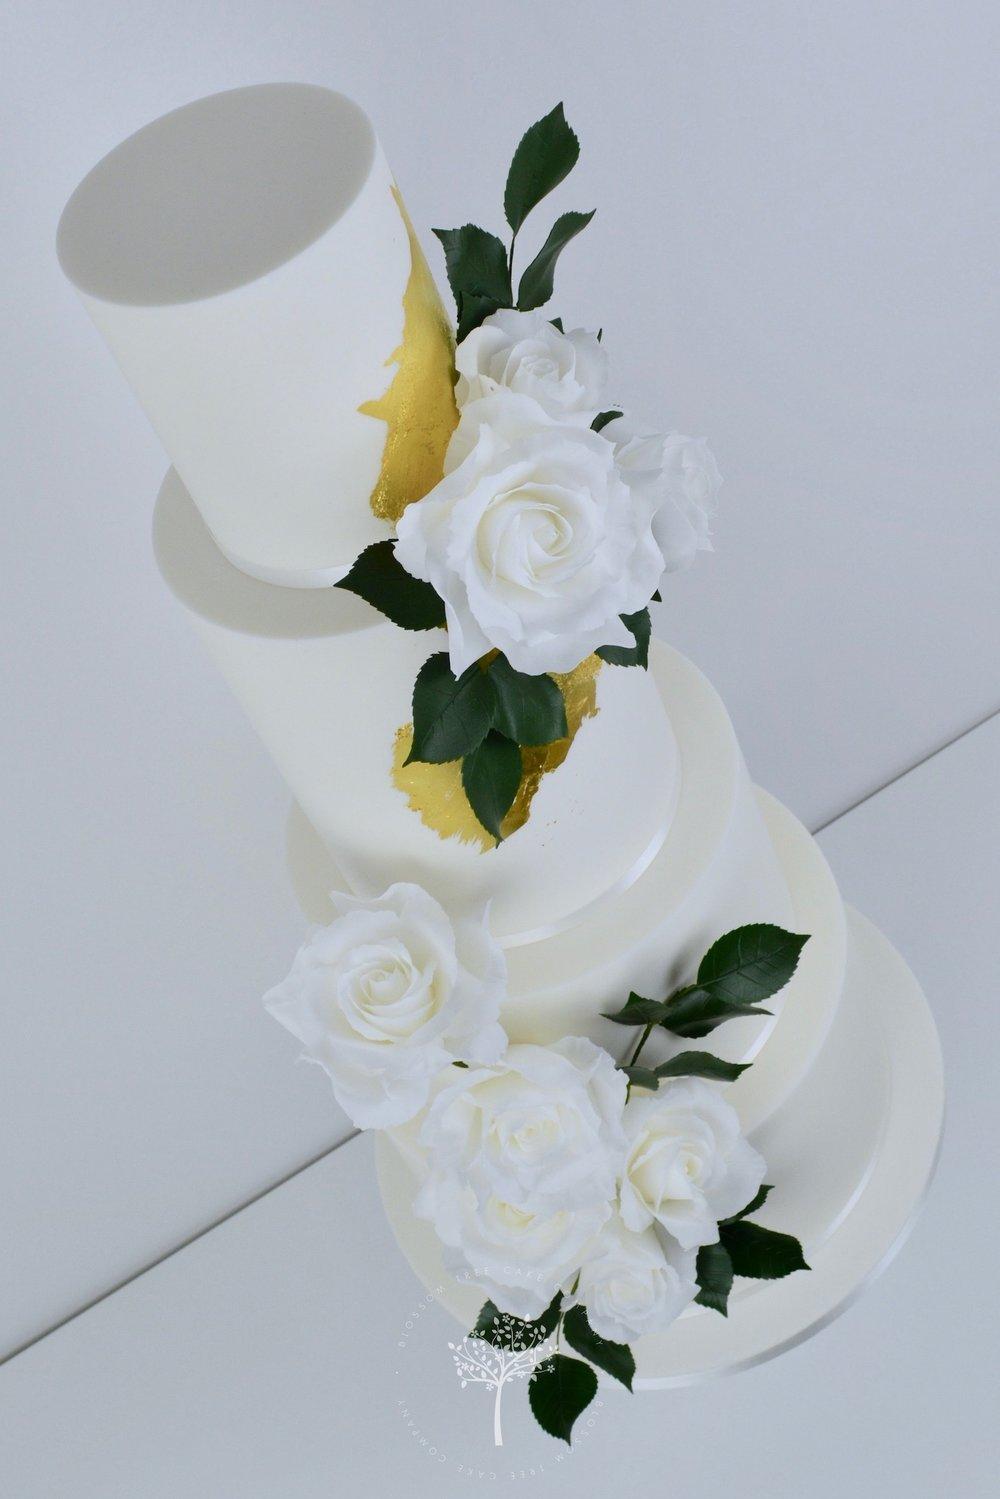 White Roses Wedding Cake by Blossom Tree Cake Company Harrogate North Yorkshire - angle.jpg